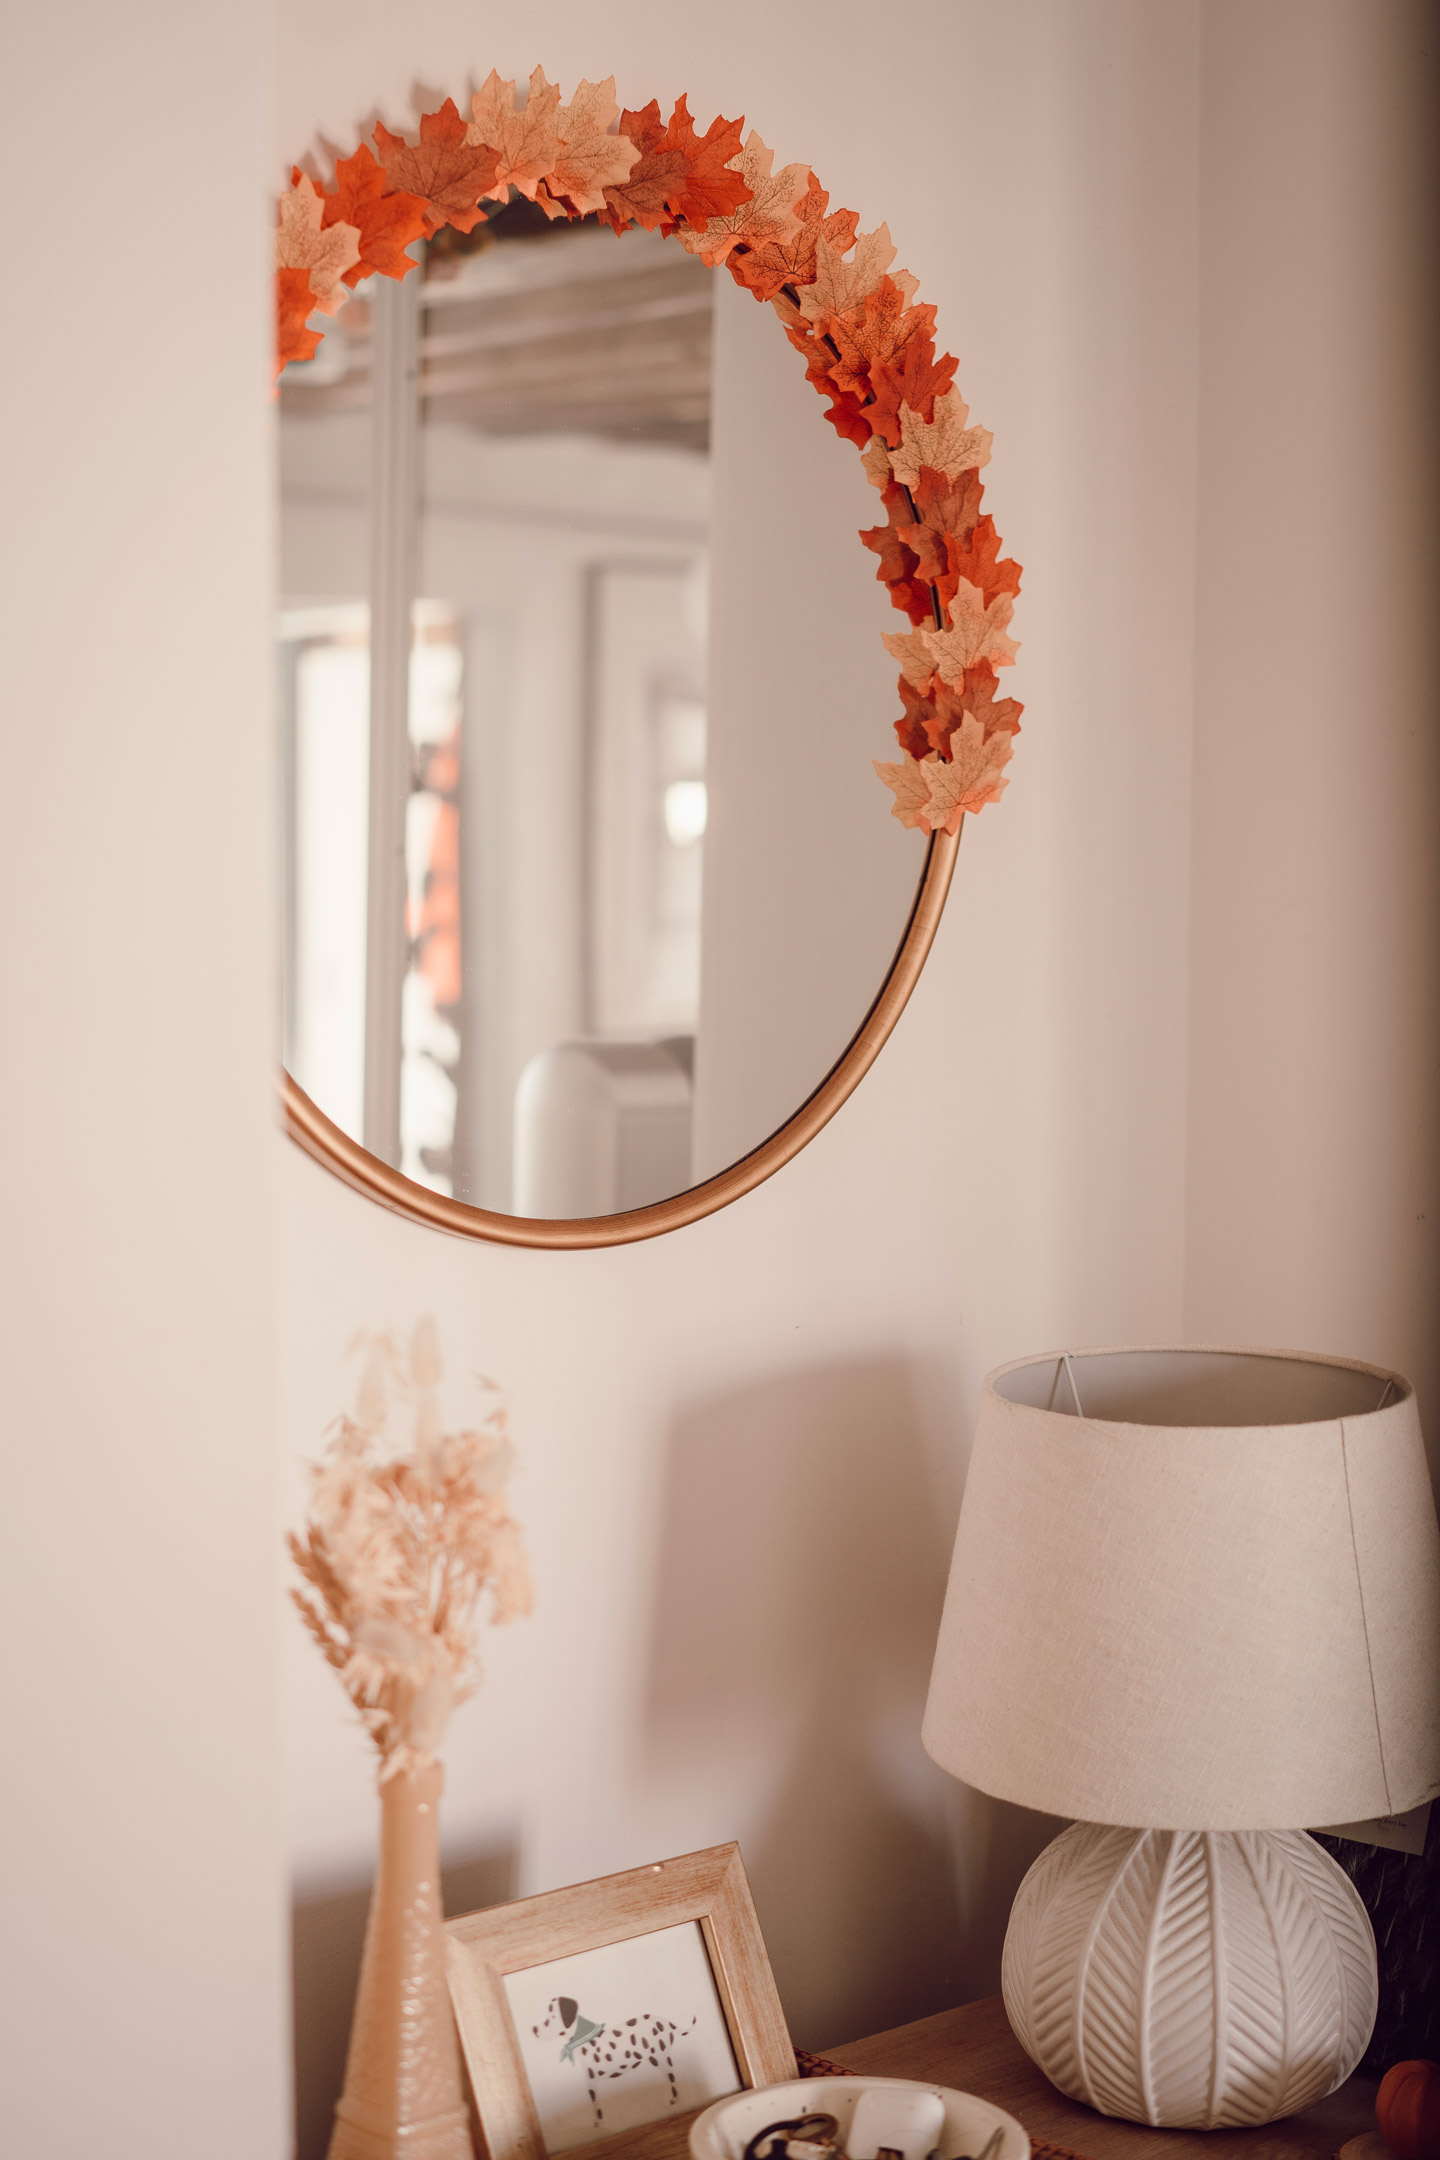 decoration-automne-03729